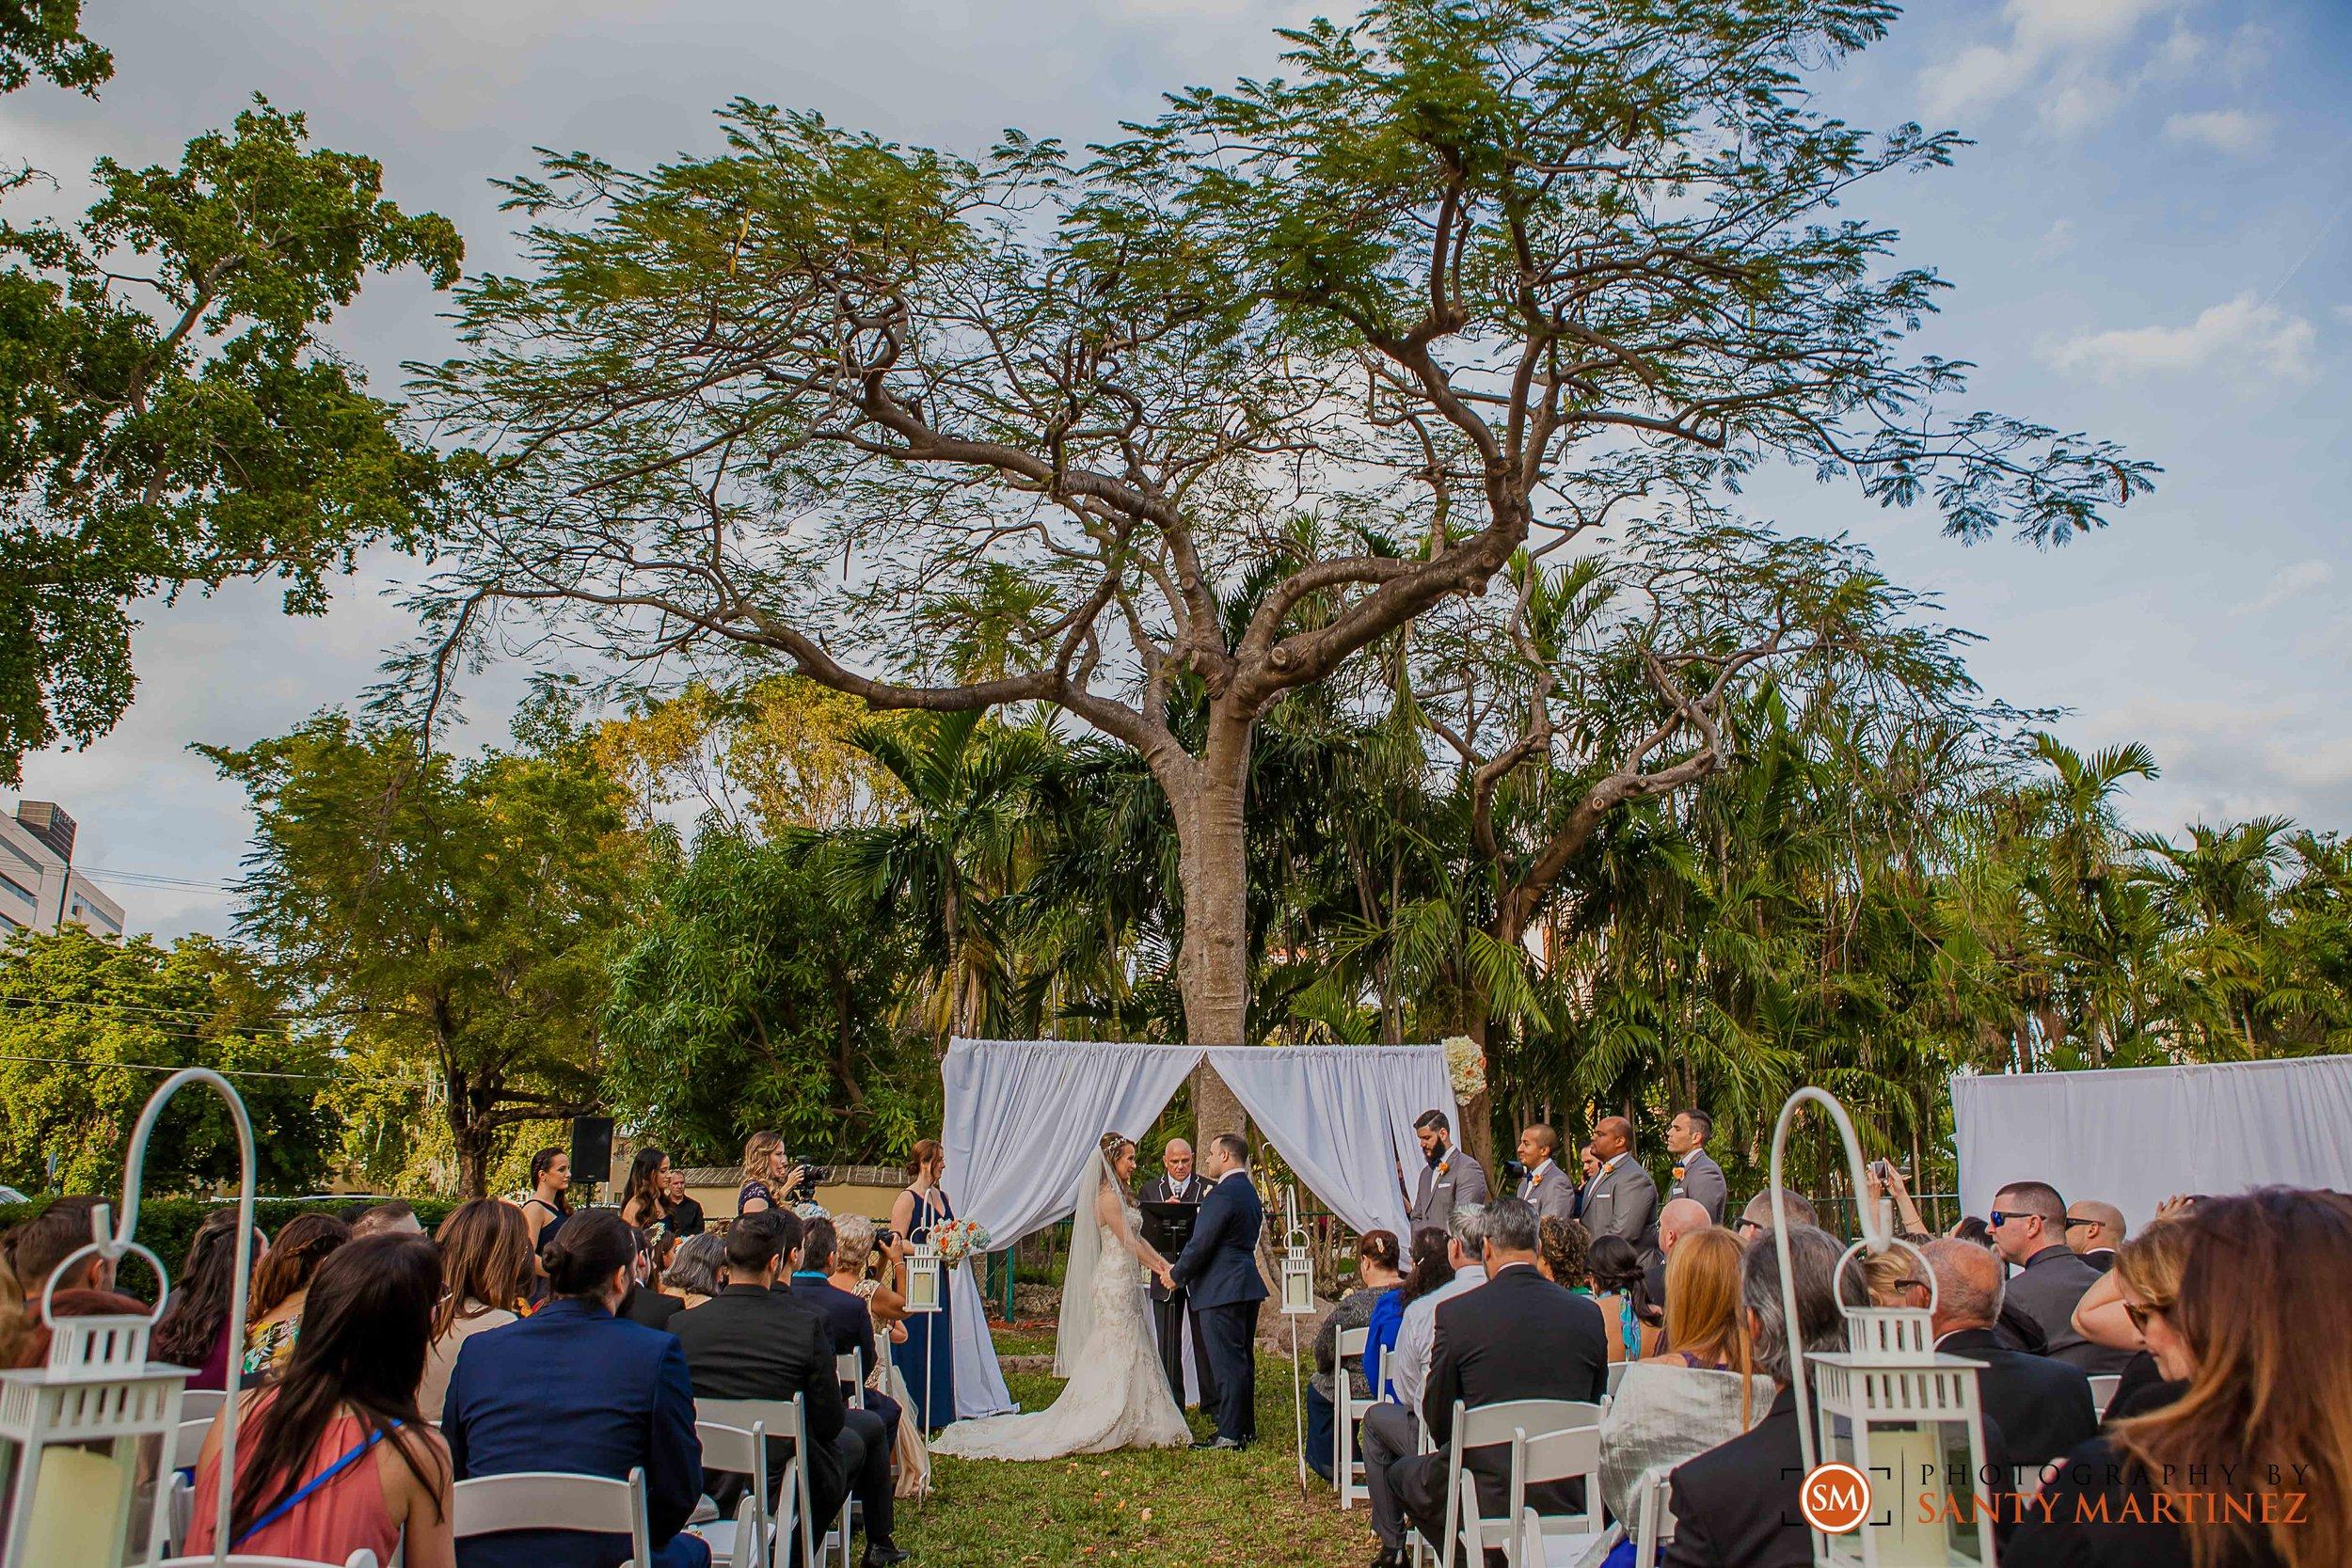 Wedding La Jolla Ballroom - Photography by Santy Martinez-30.jpg